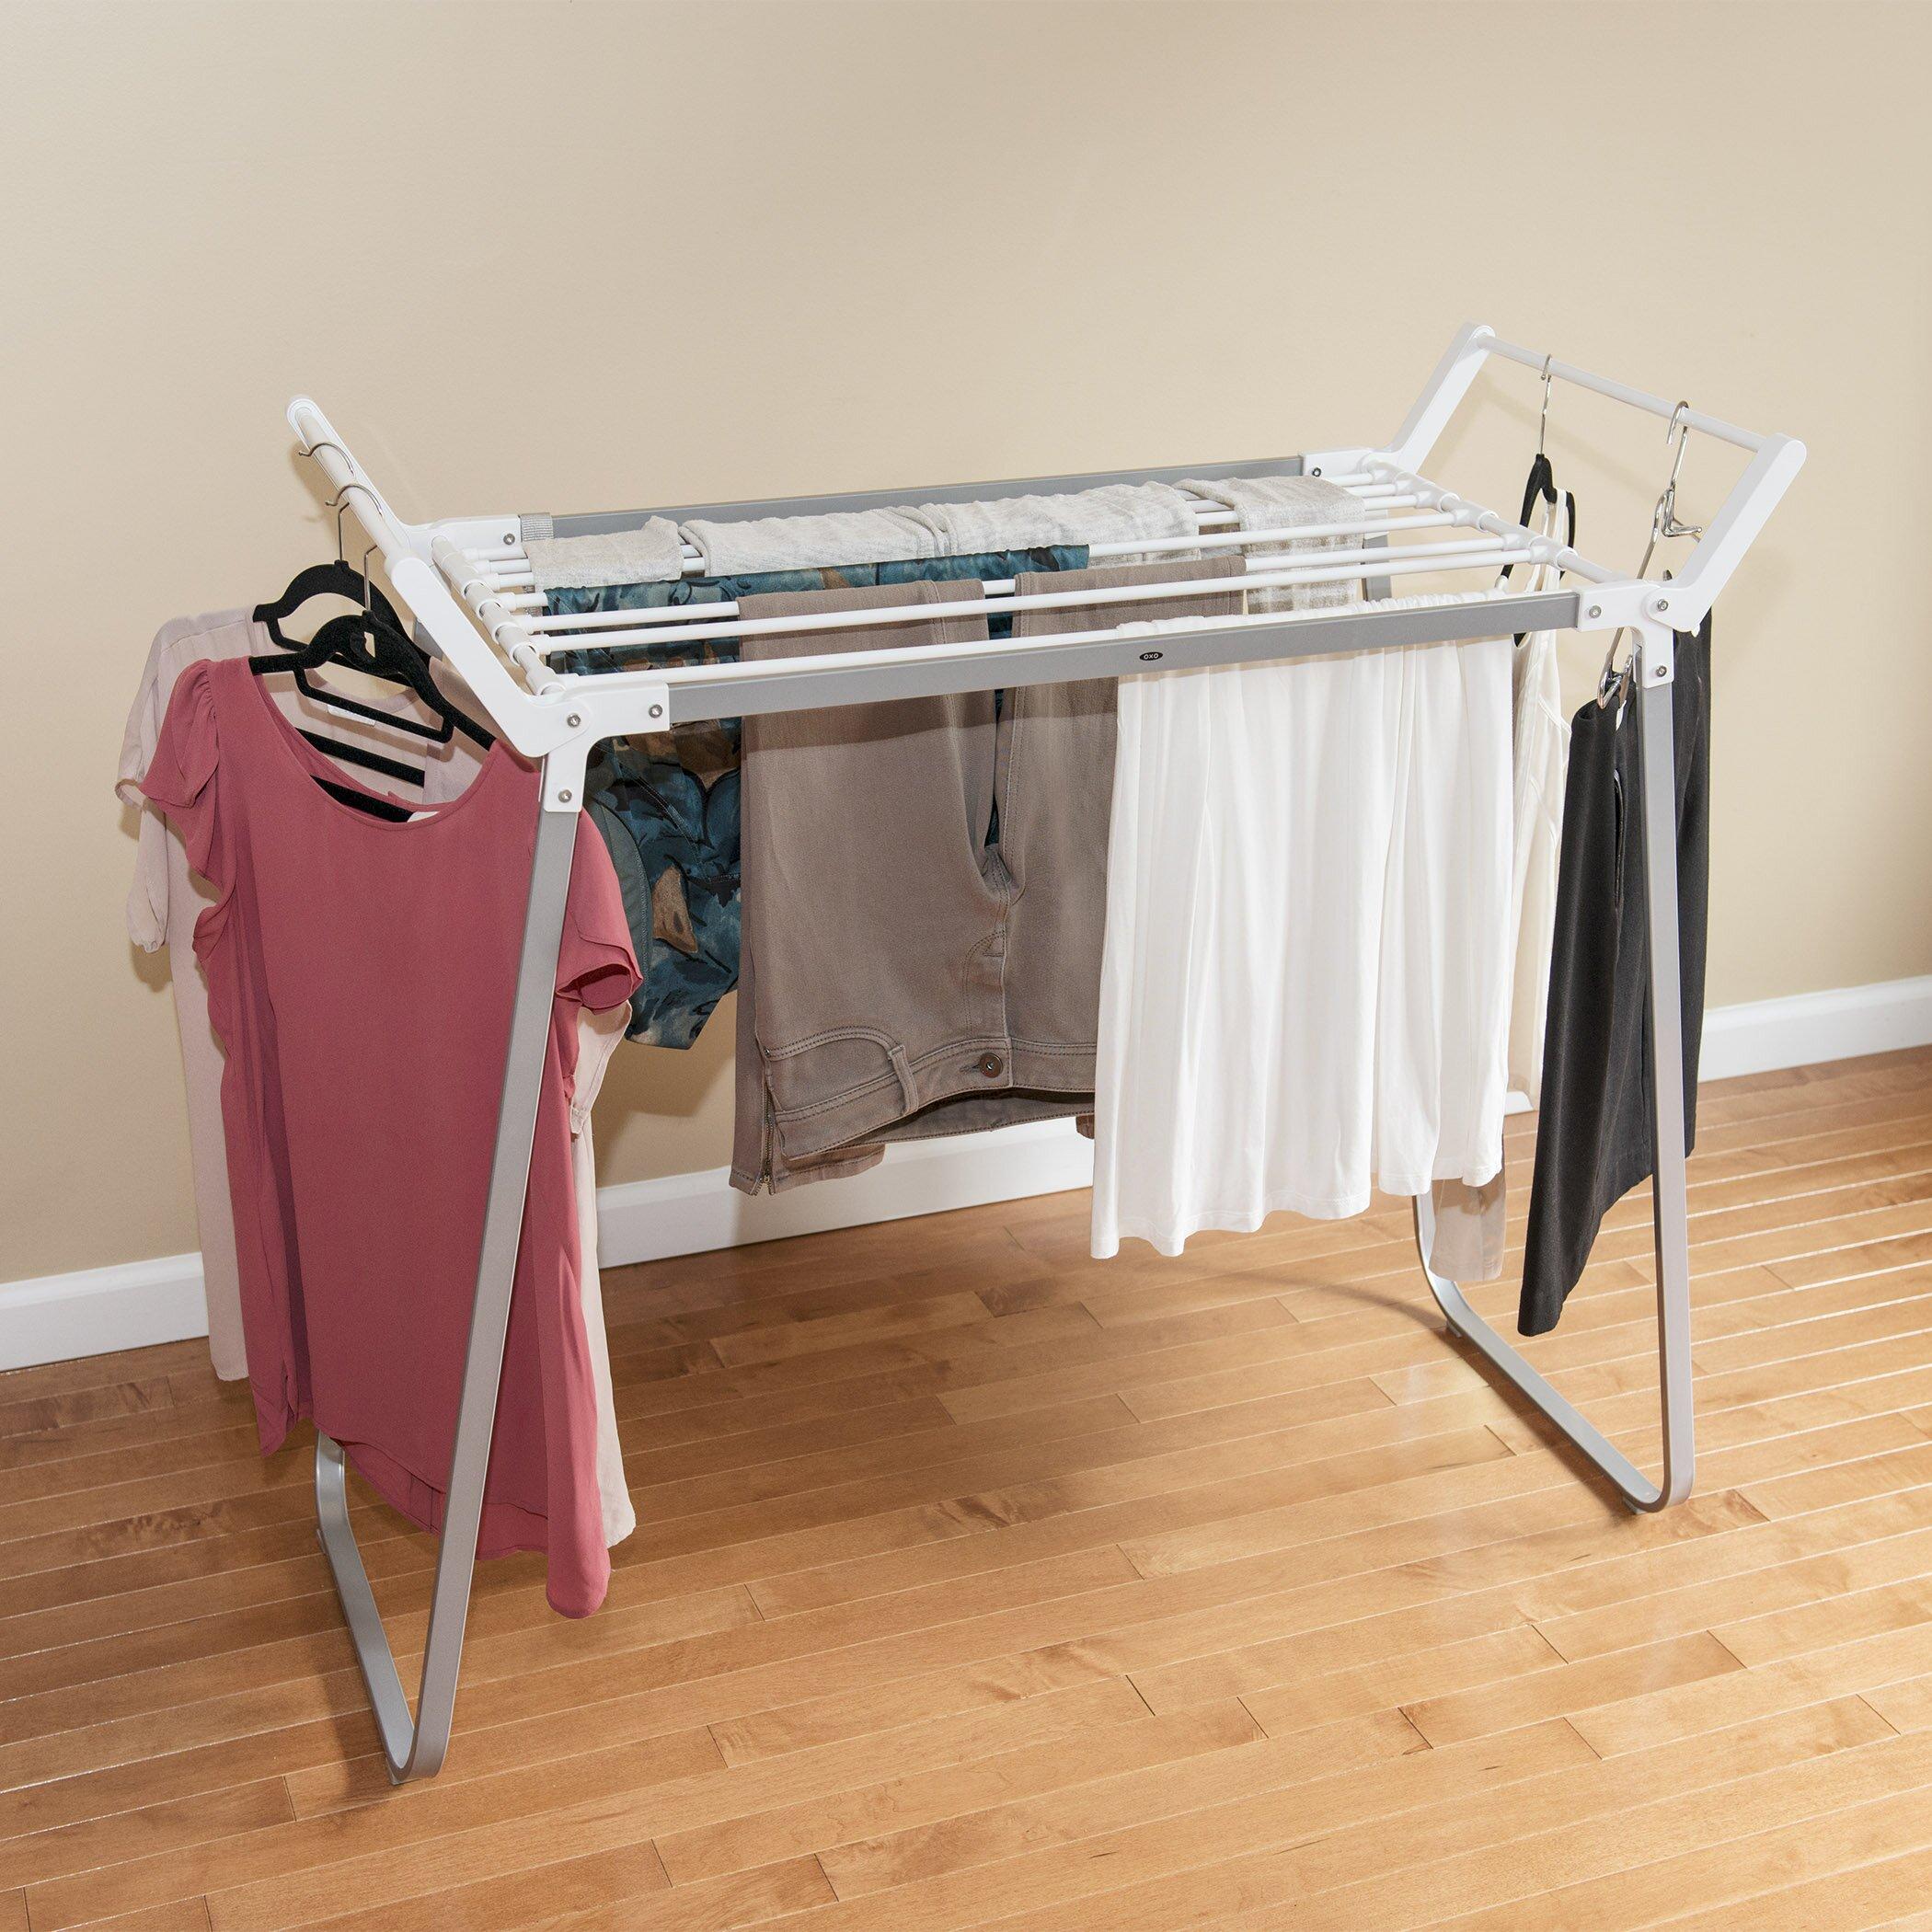 Oxo Good Grips Laundry Drying Center Amp Reviews Wayfair